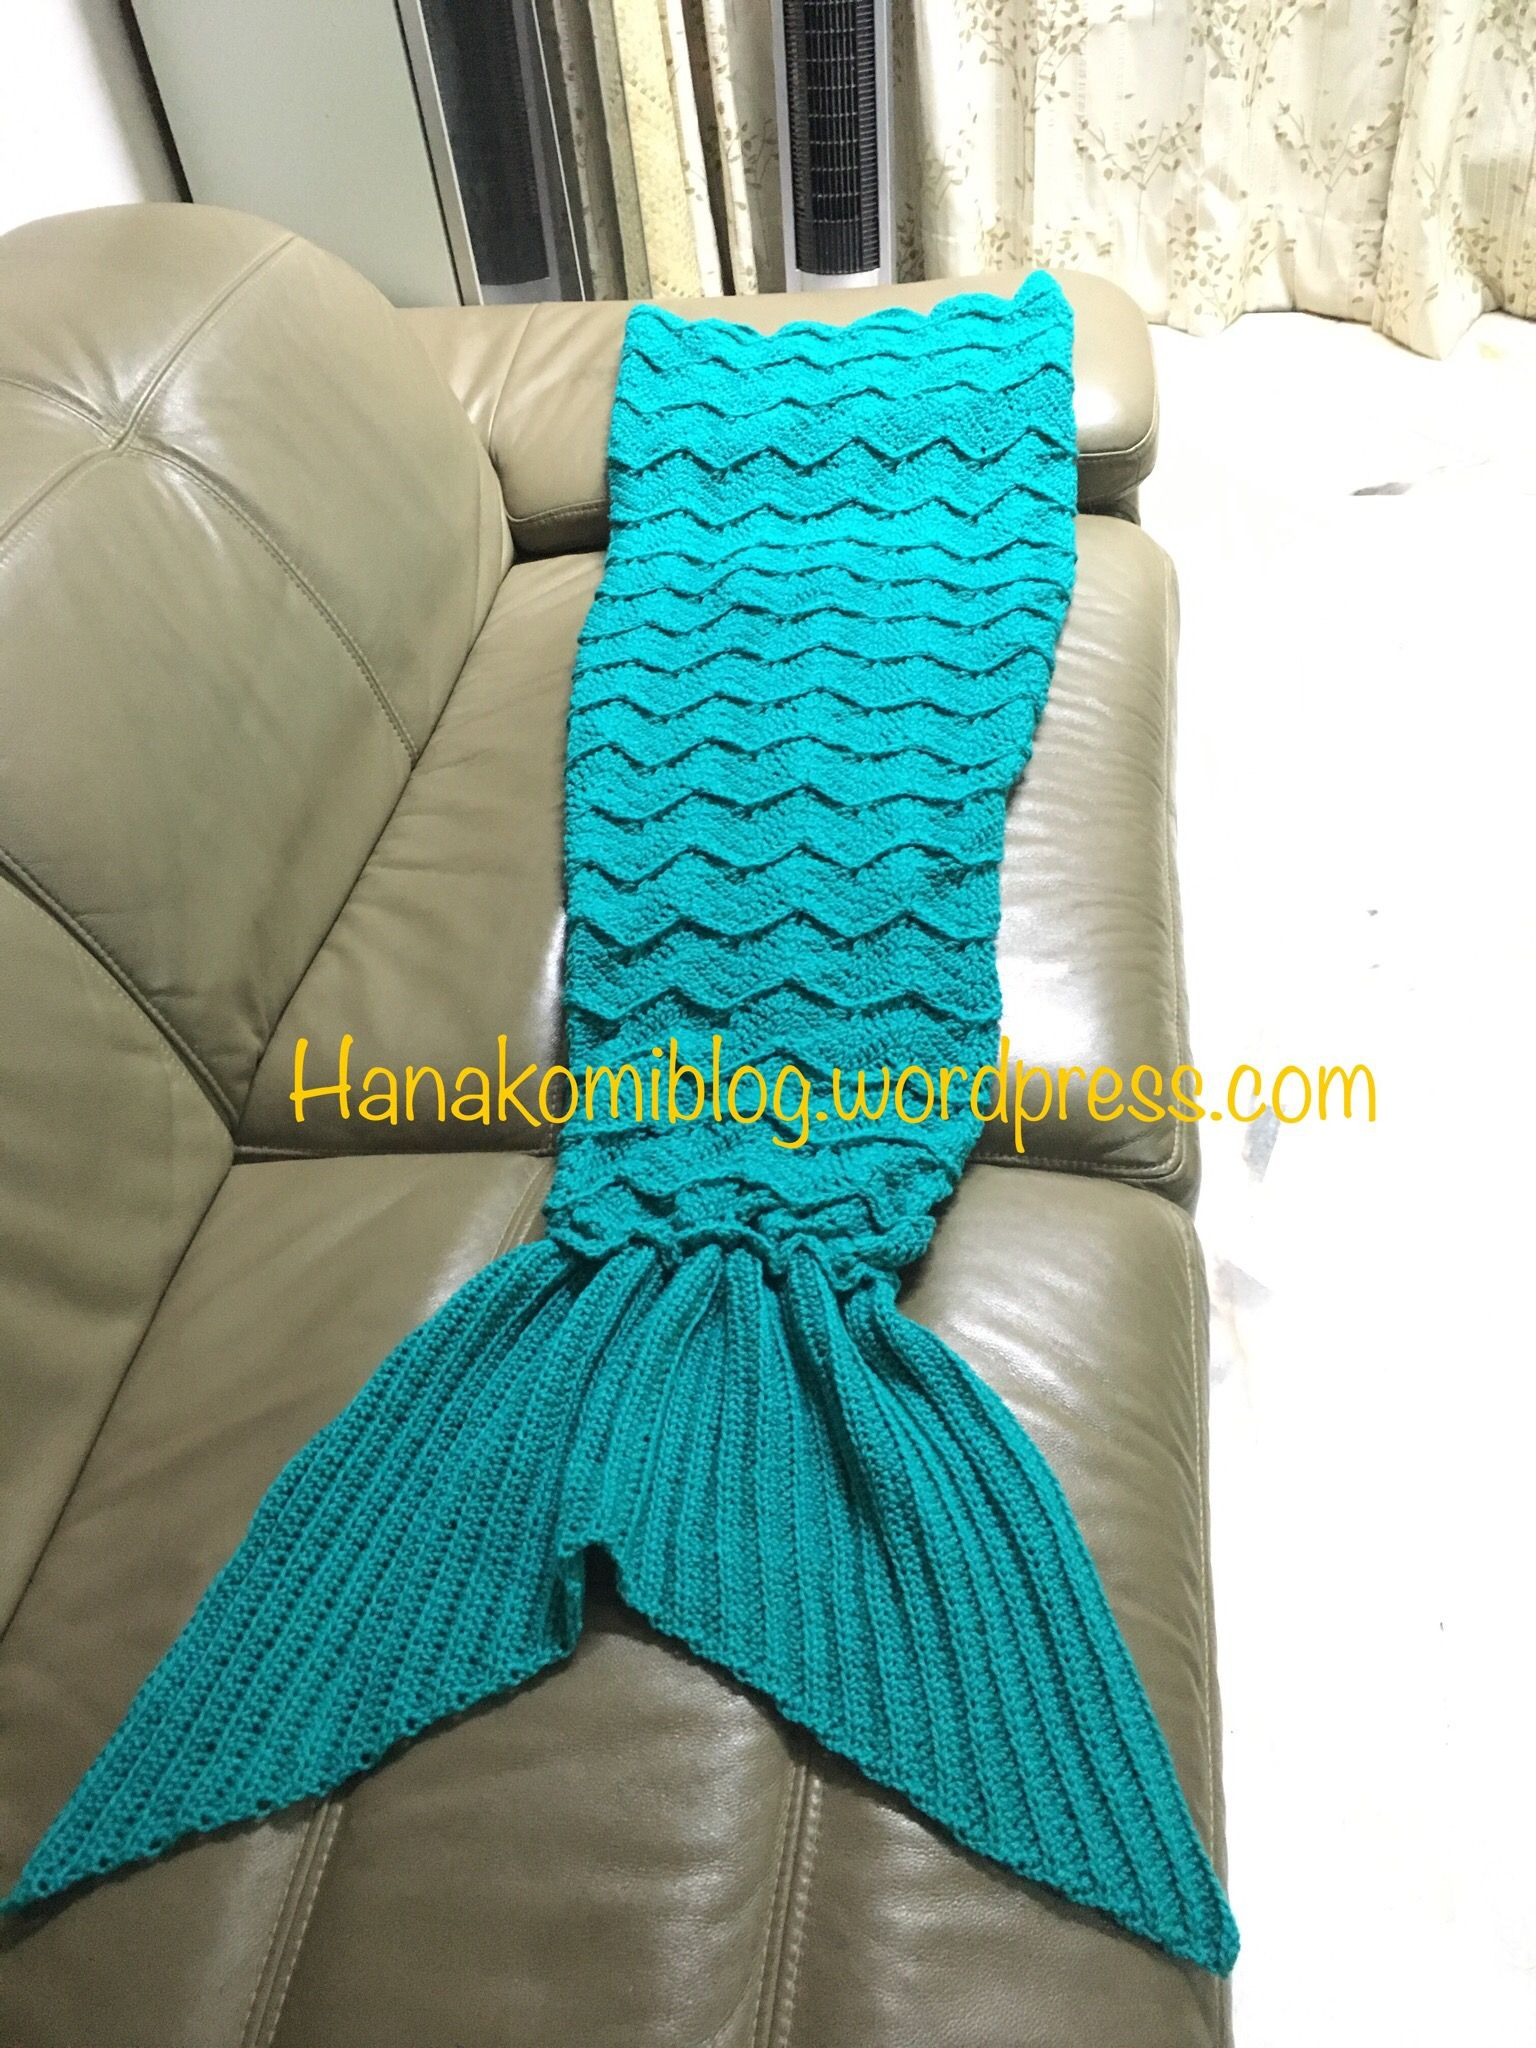 The syira aka chevron mermaid tail blanket adult free crochet the syira aka chevron mermaid tail blanket adult free crochet pattern bankloansurffo Choice Image